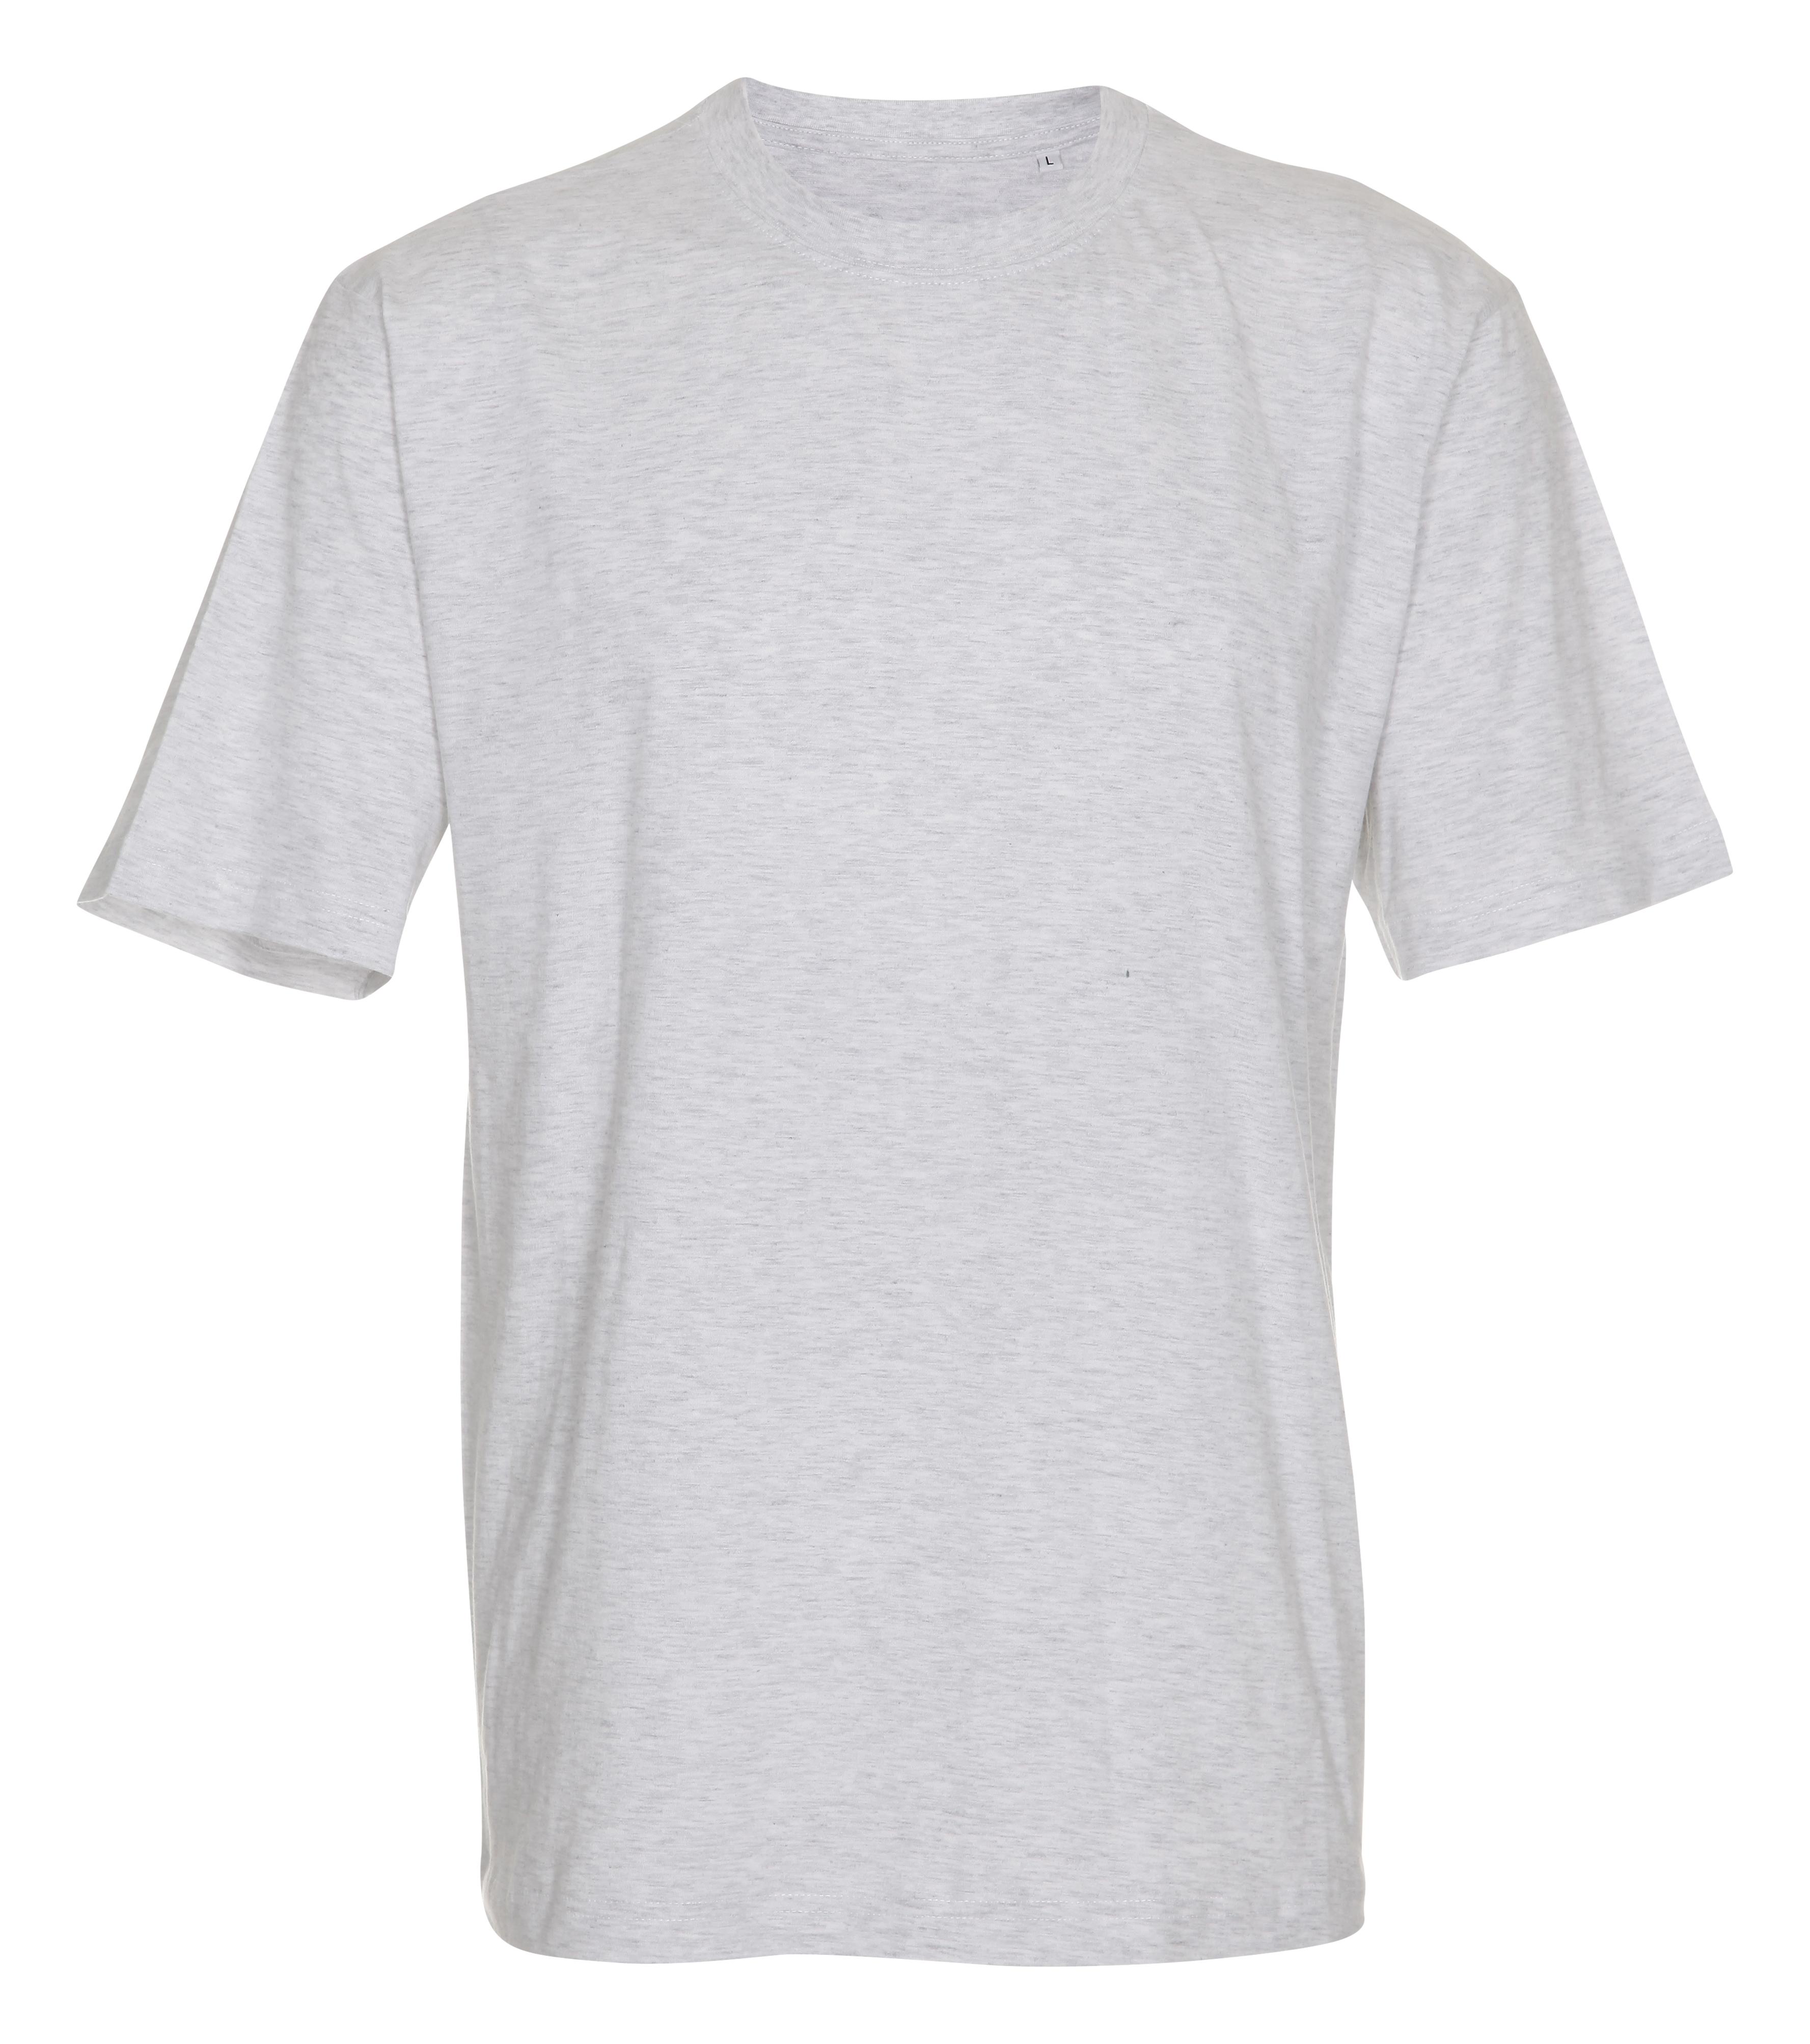 Design Your Own - T-shirt (Vinyl Print)